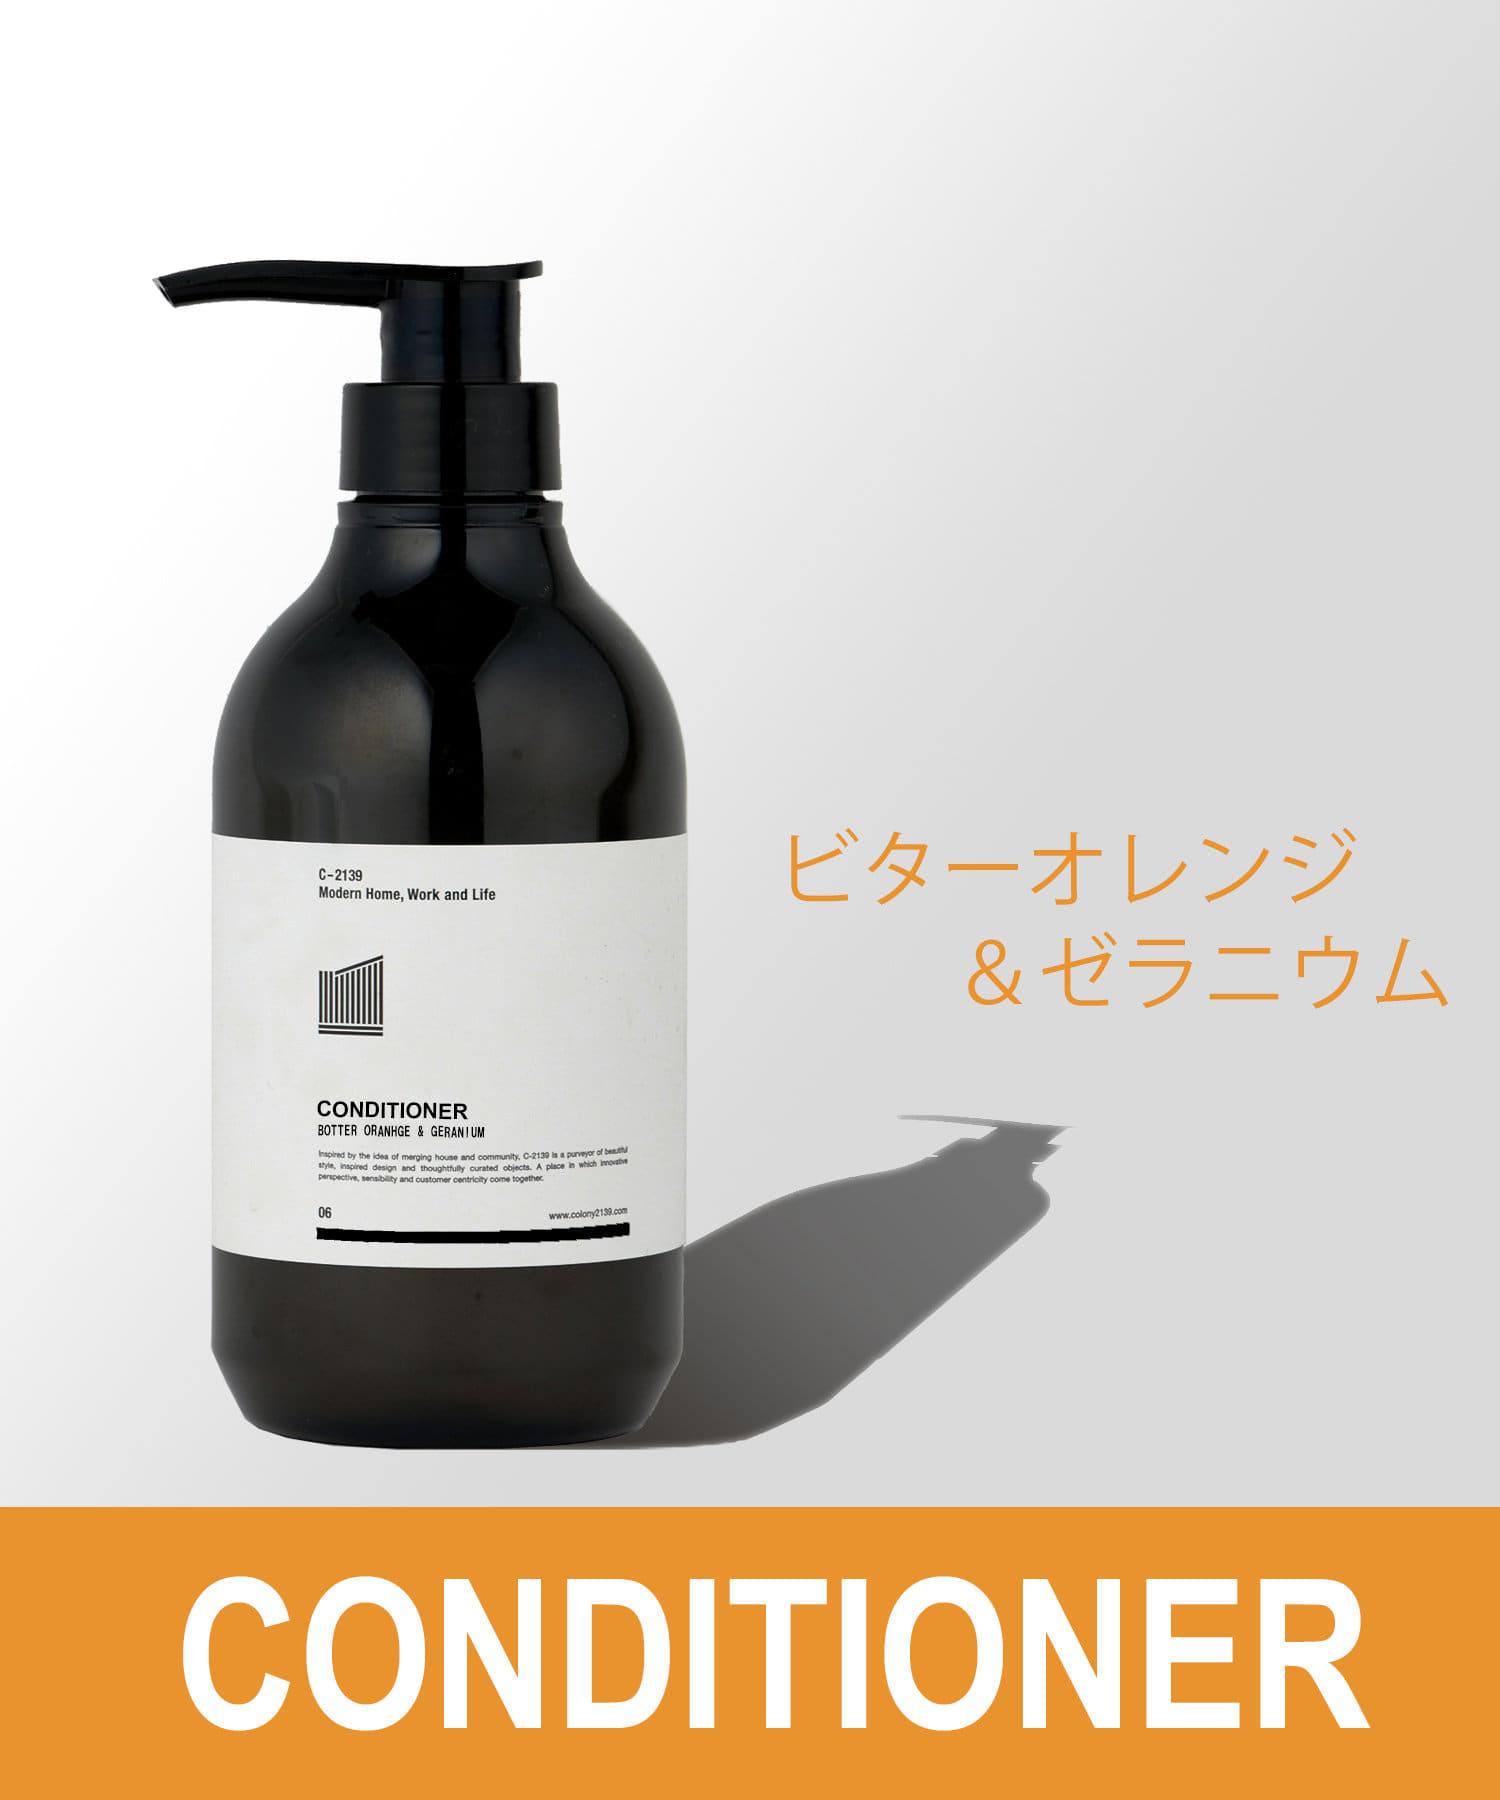 COLONY 2139(コロニー トゥーワンスリーナイン) ライフスタイル コンディショナー(ビターオレンジ&ゼラニウムの香り) ブラック